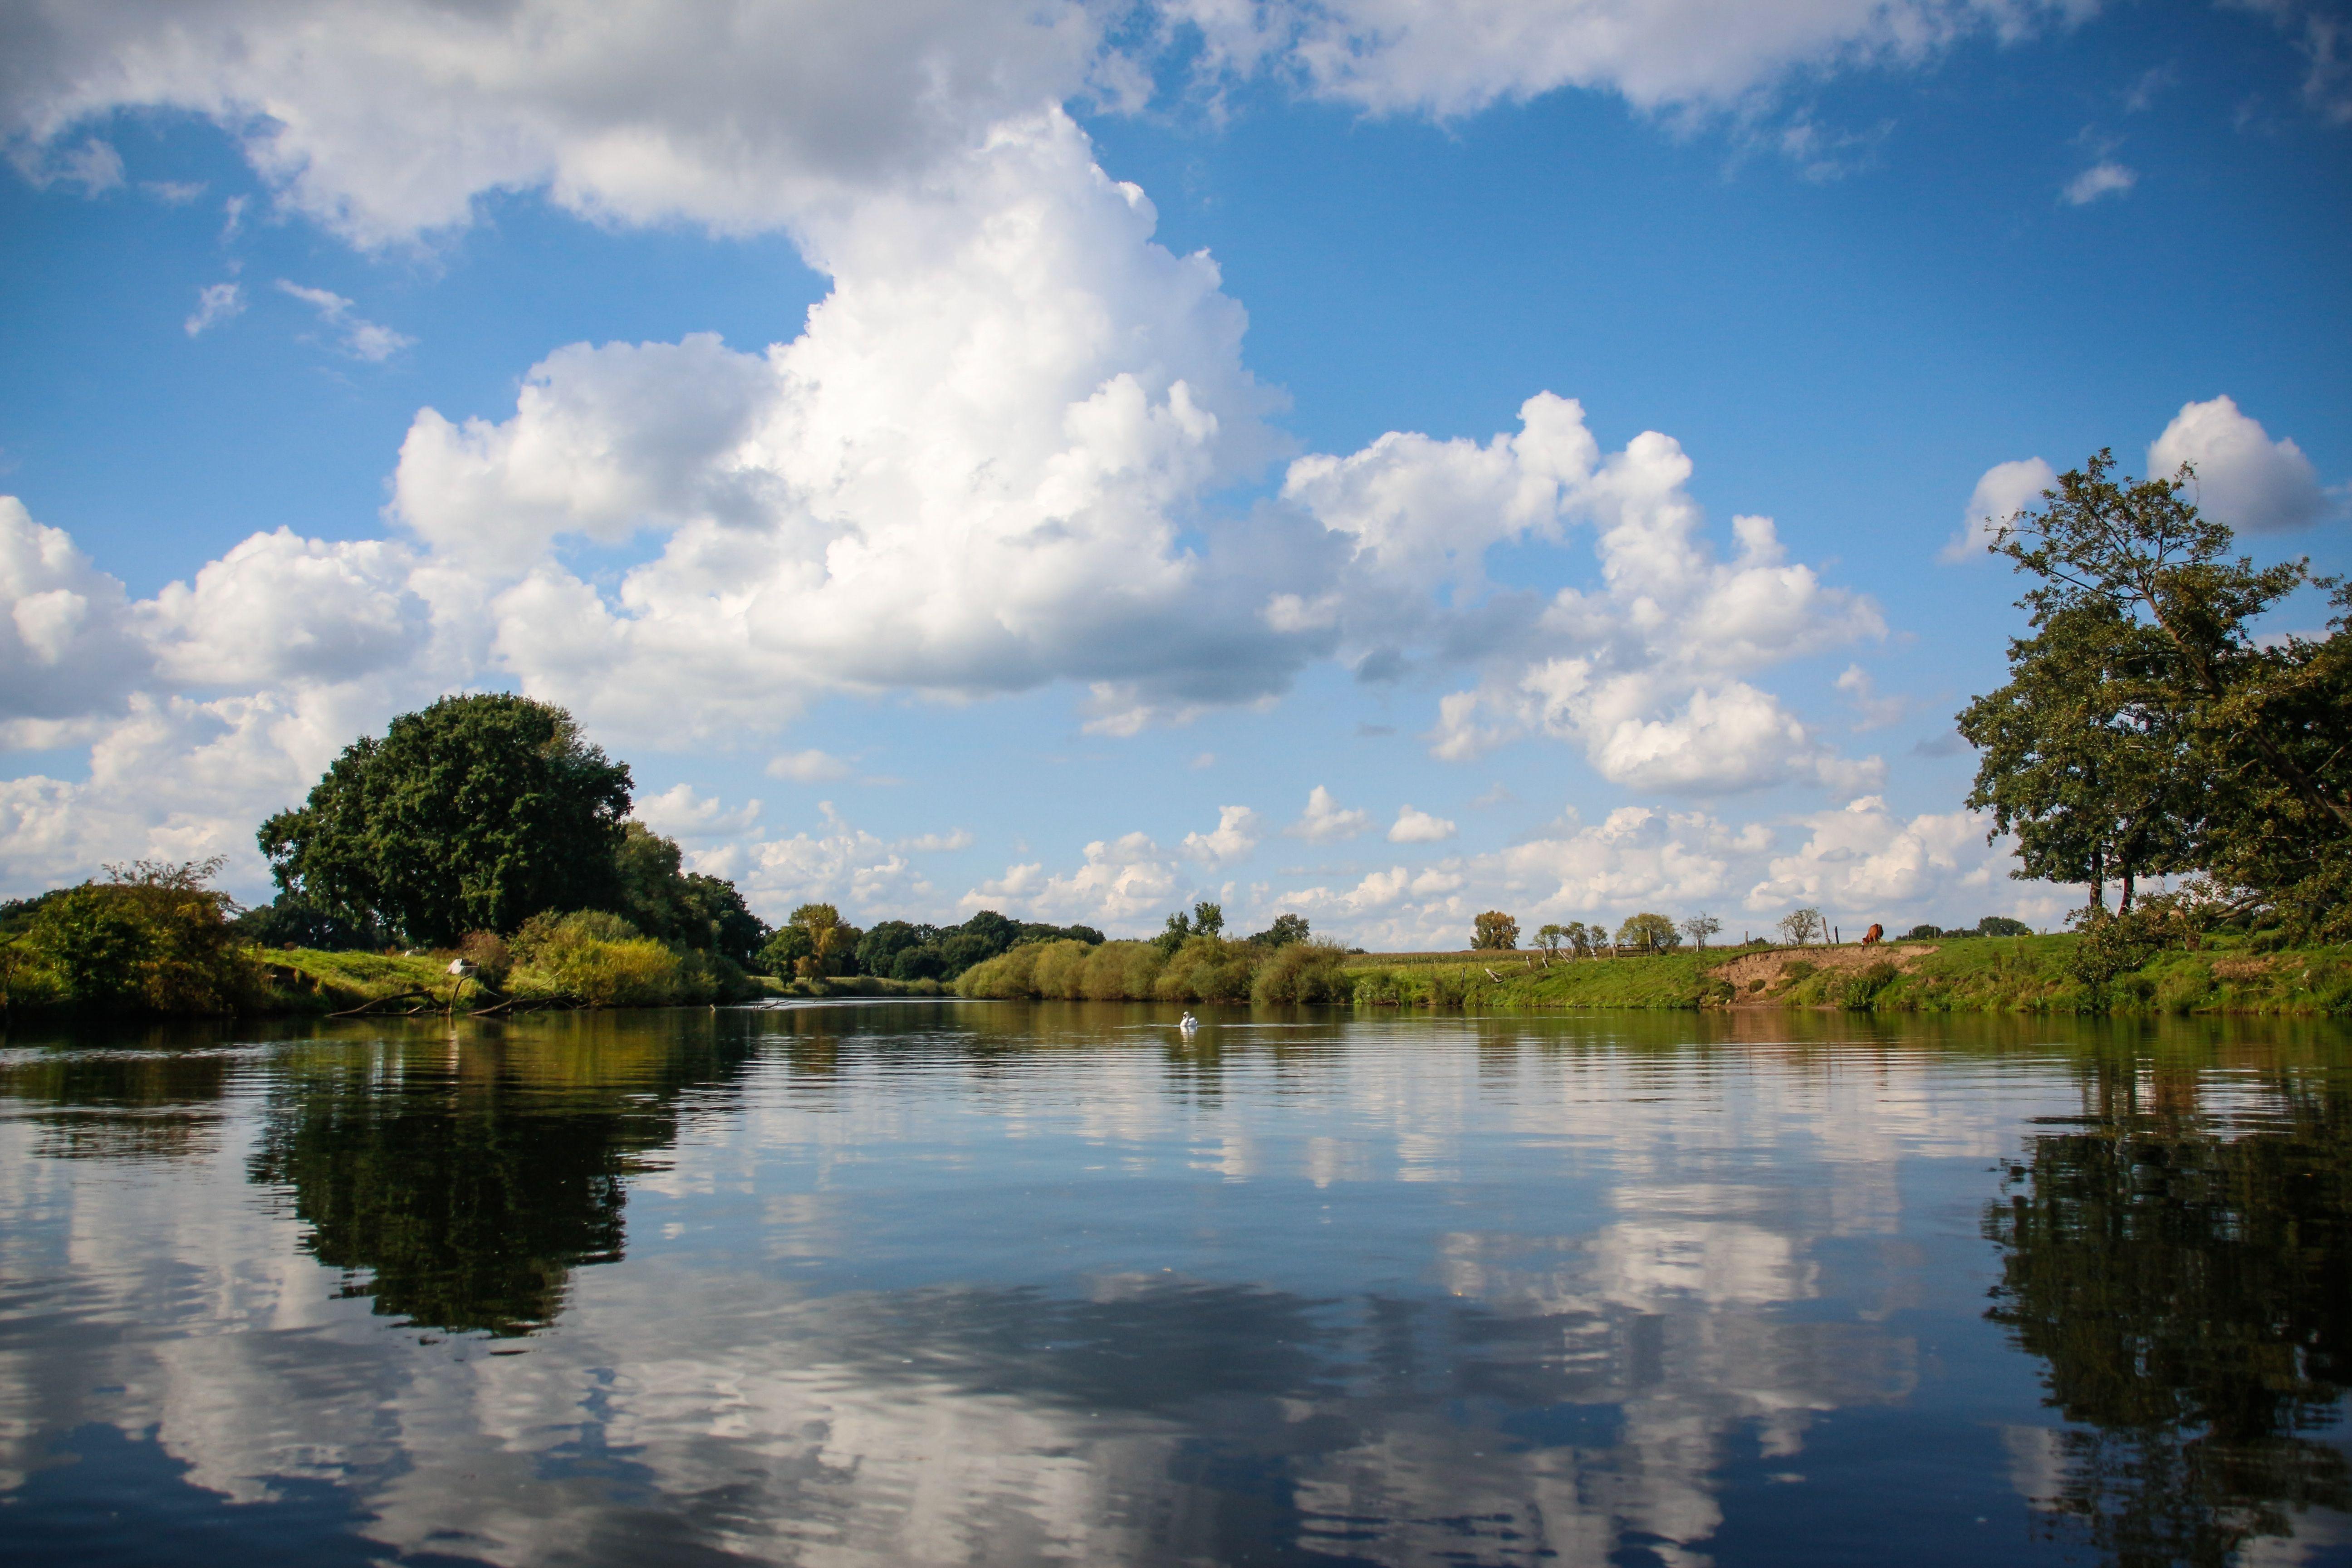 Bootstour auf dem Dortmund-Ems-Kanal